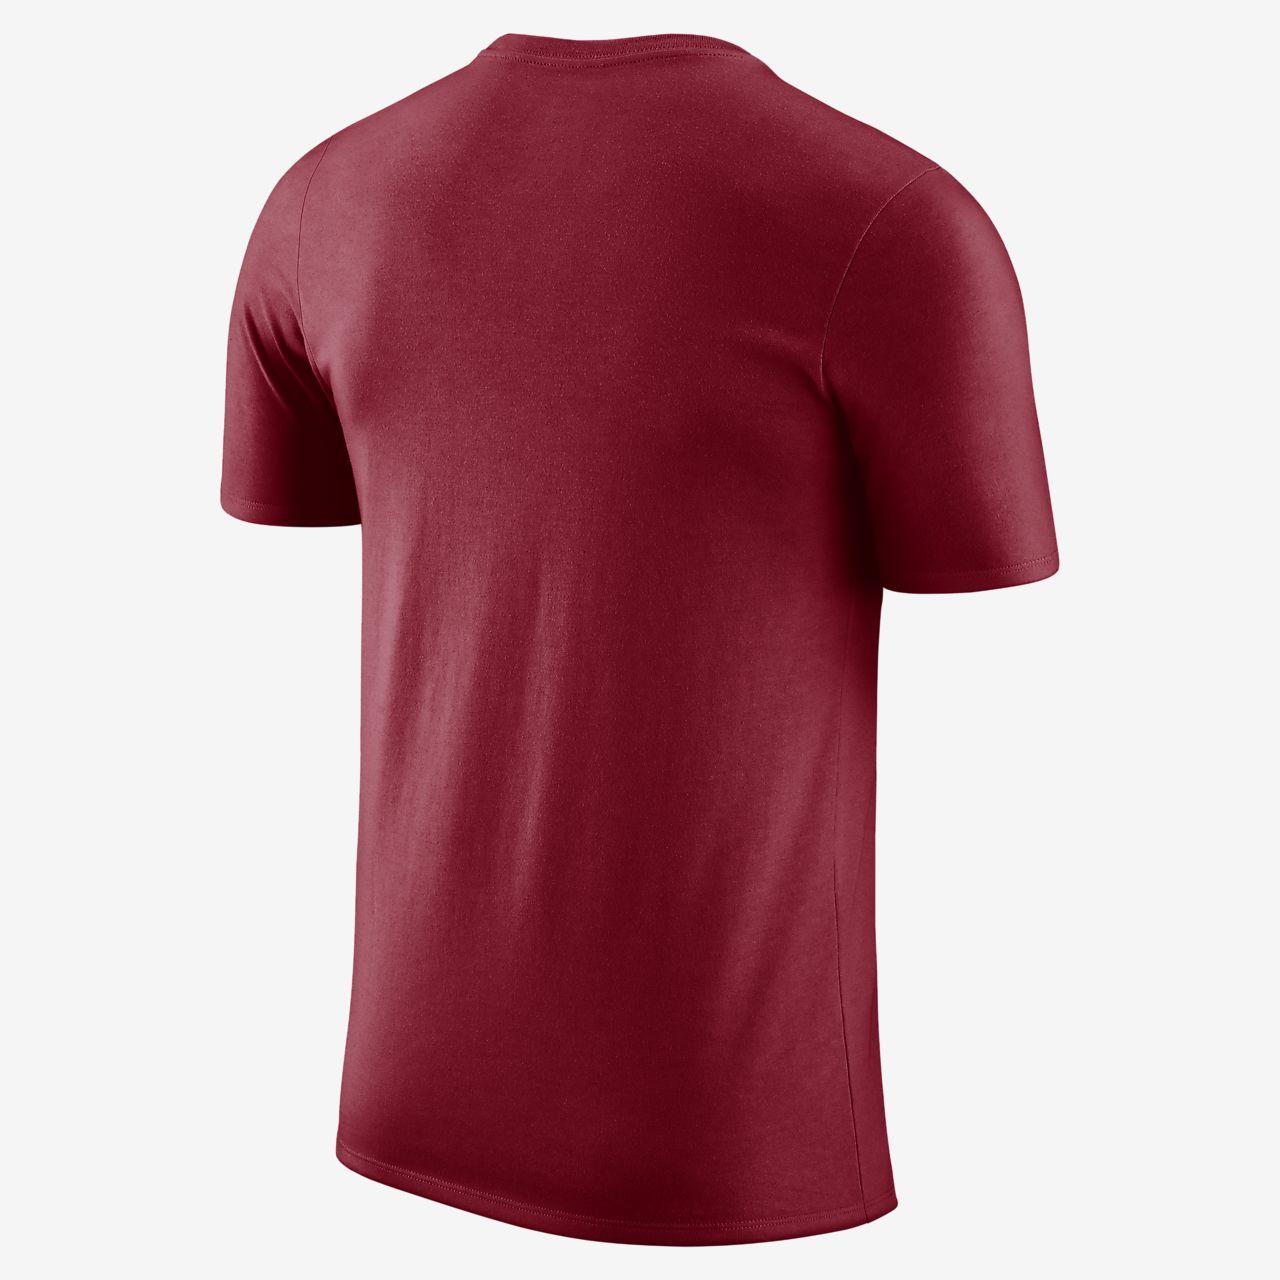 67188343434 Miami Heat Nike Dri-FIT Men s NBA T-Shirt. Nike.com